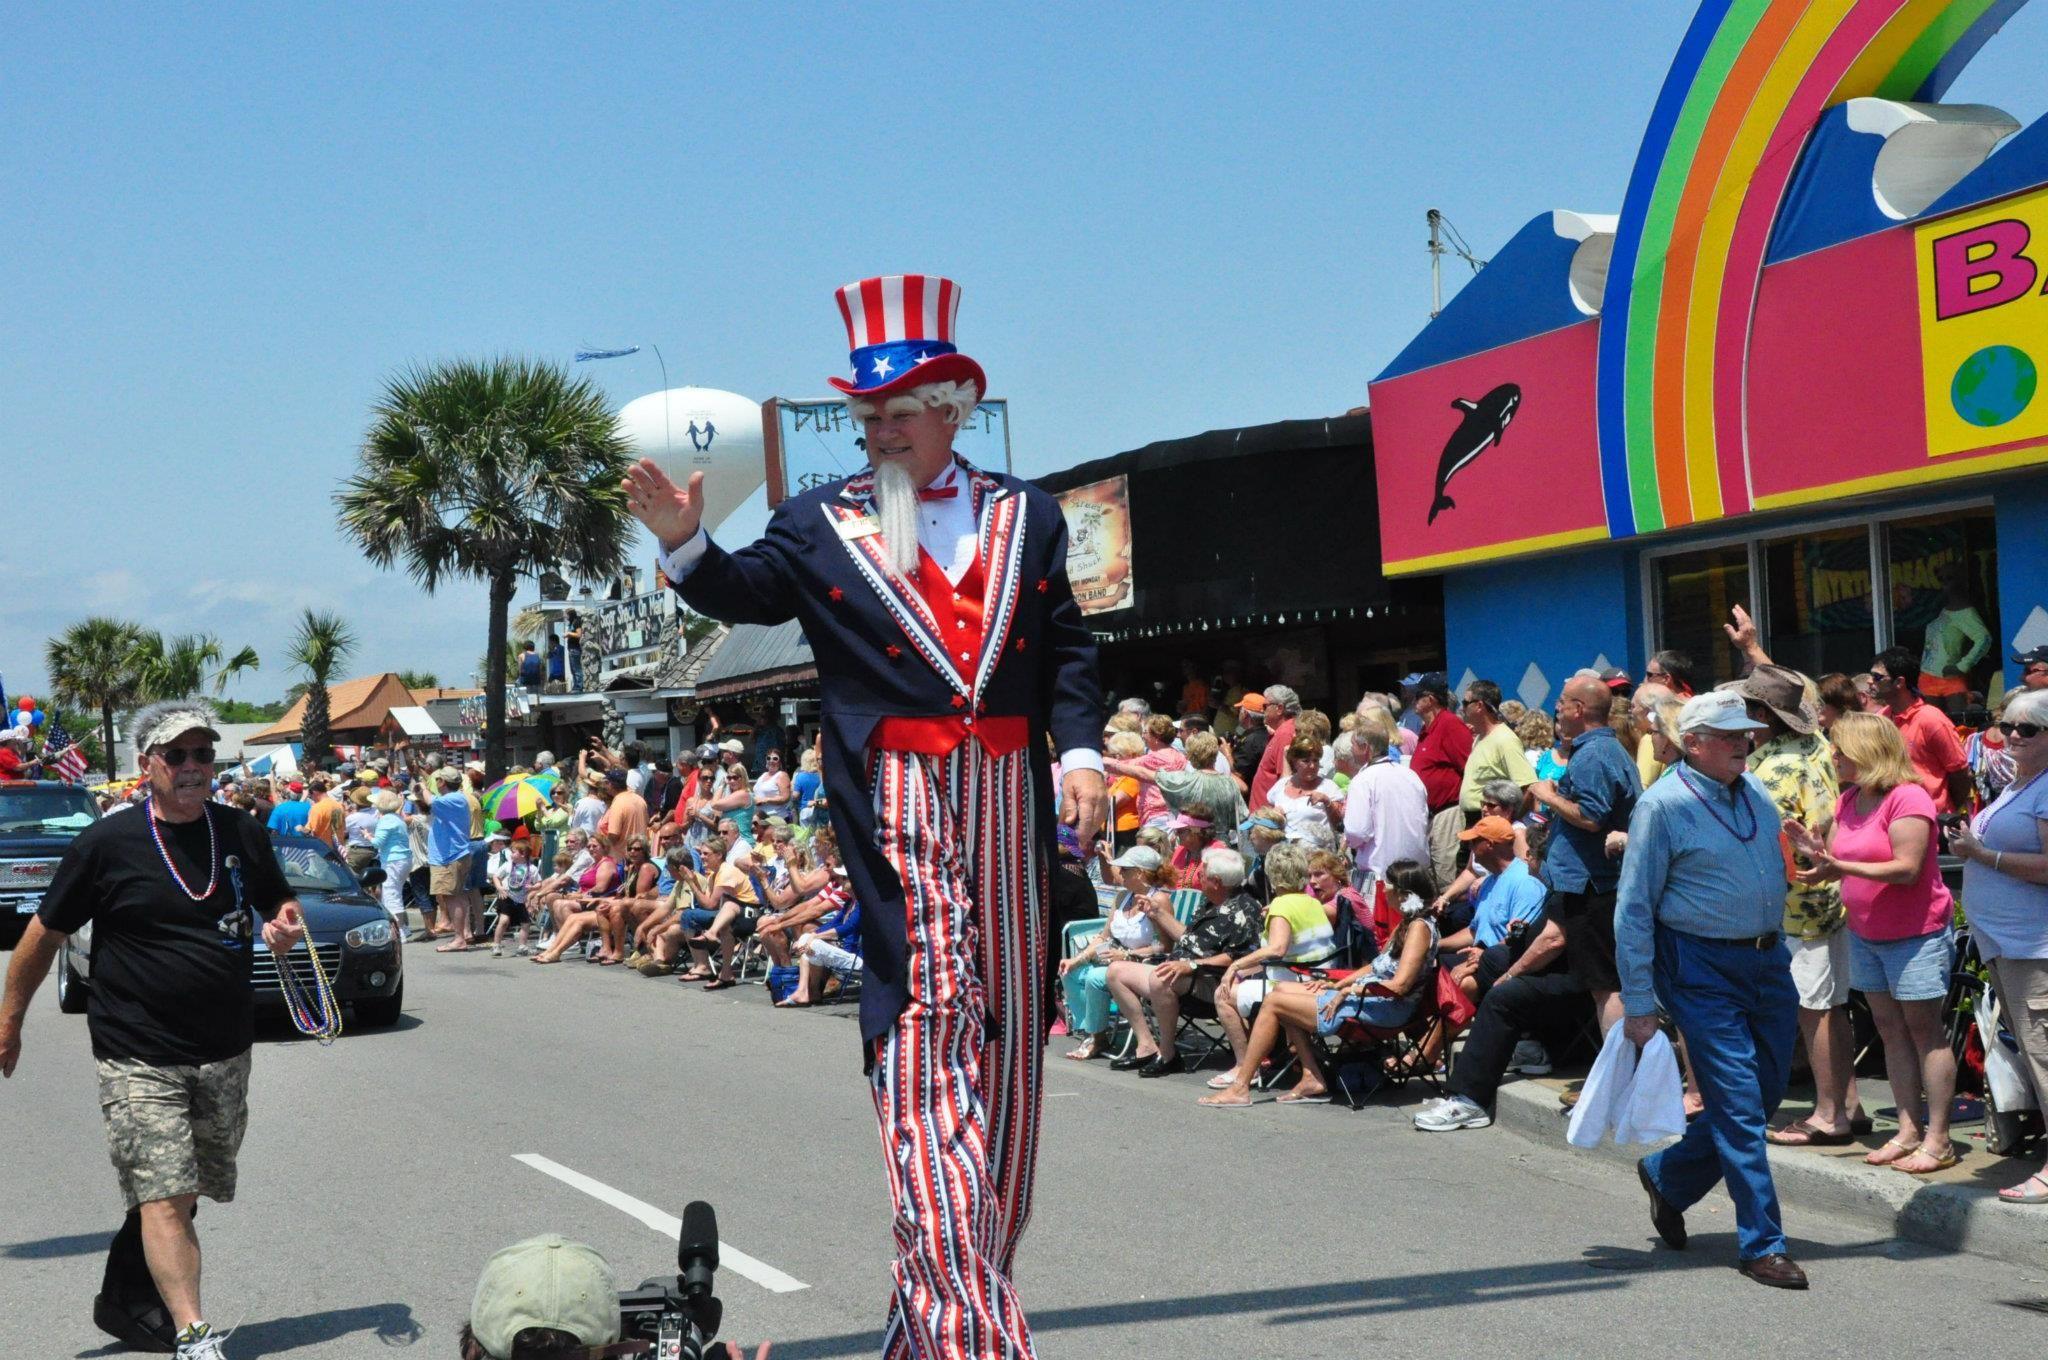 SOS parade main street North Myrtle Beach | Photography, Posing ...